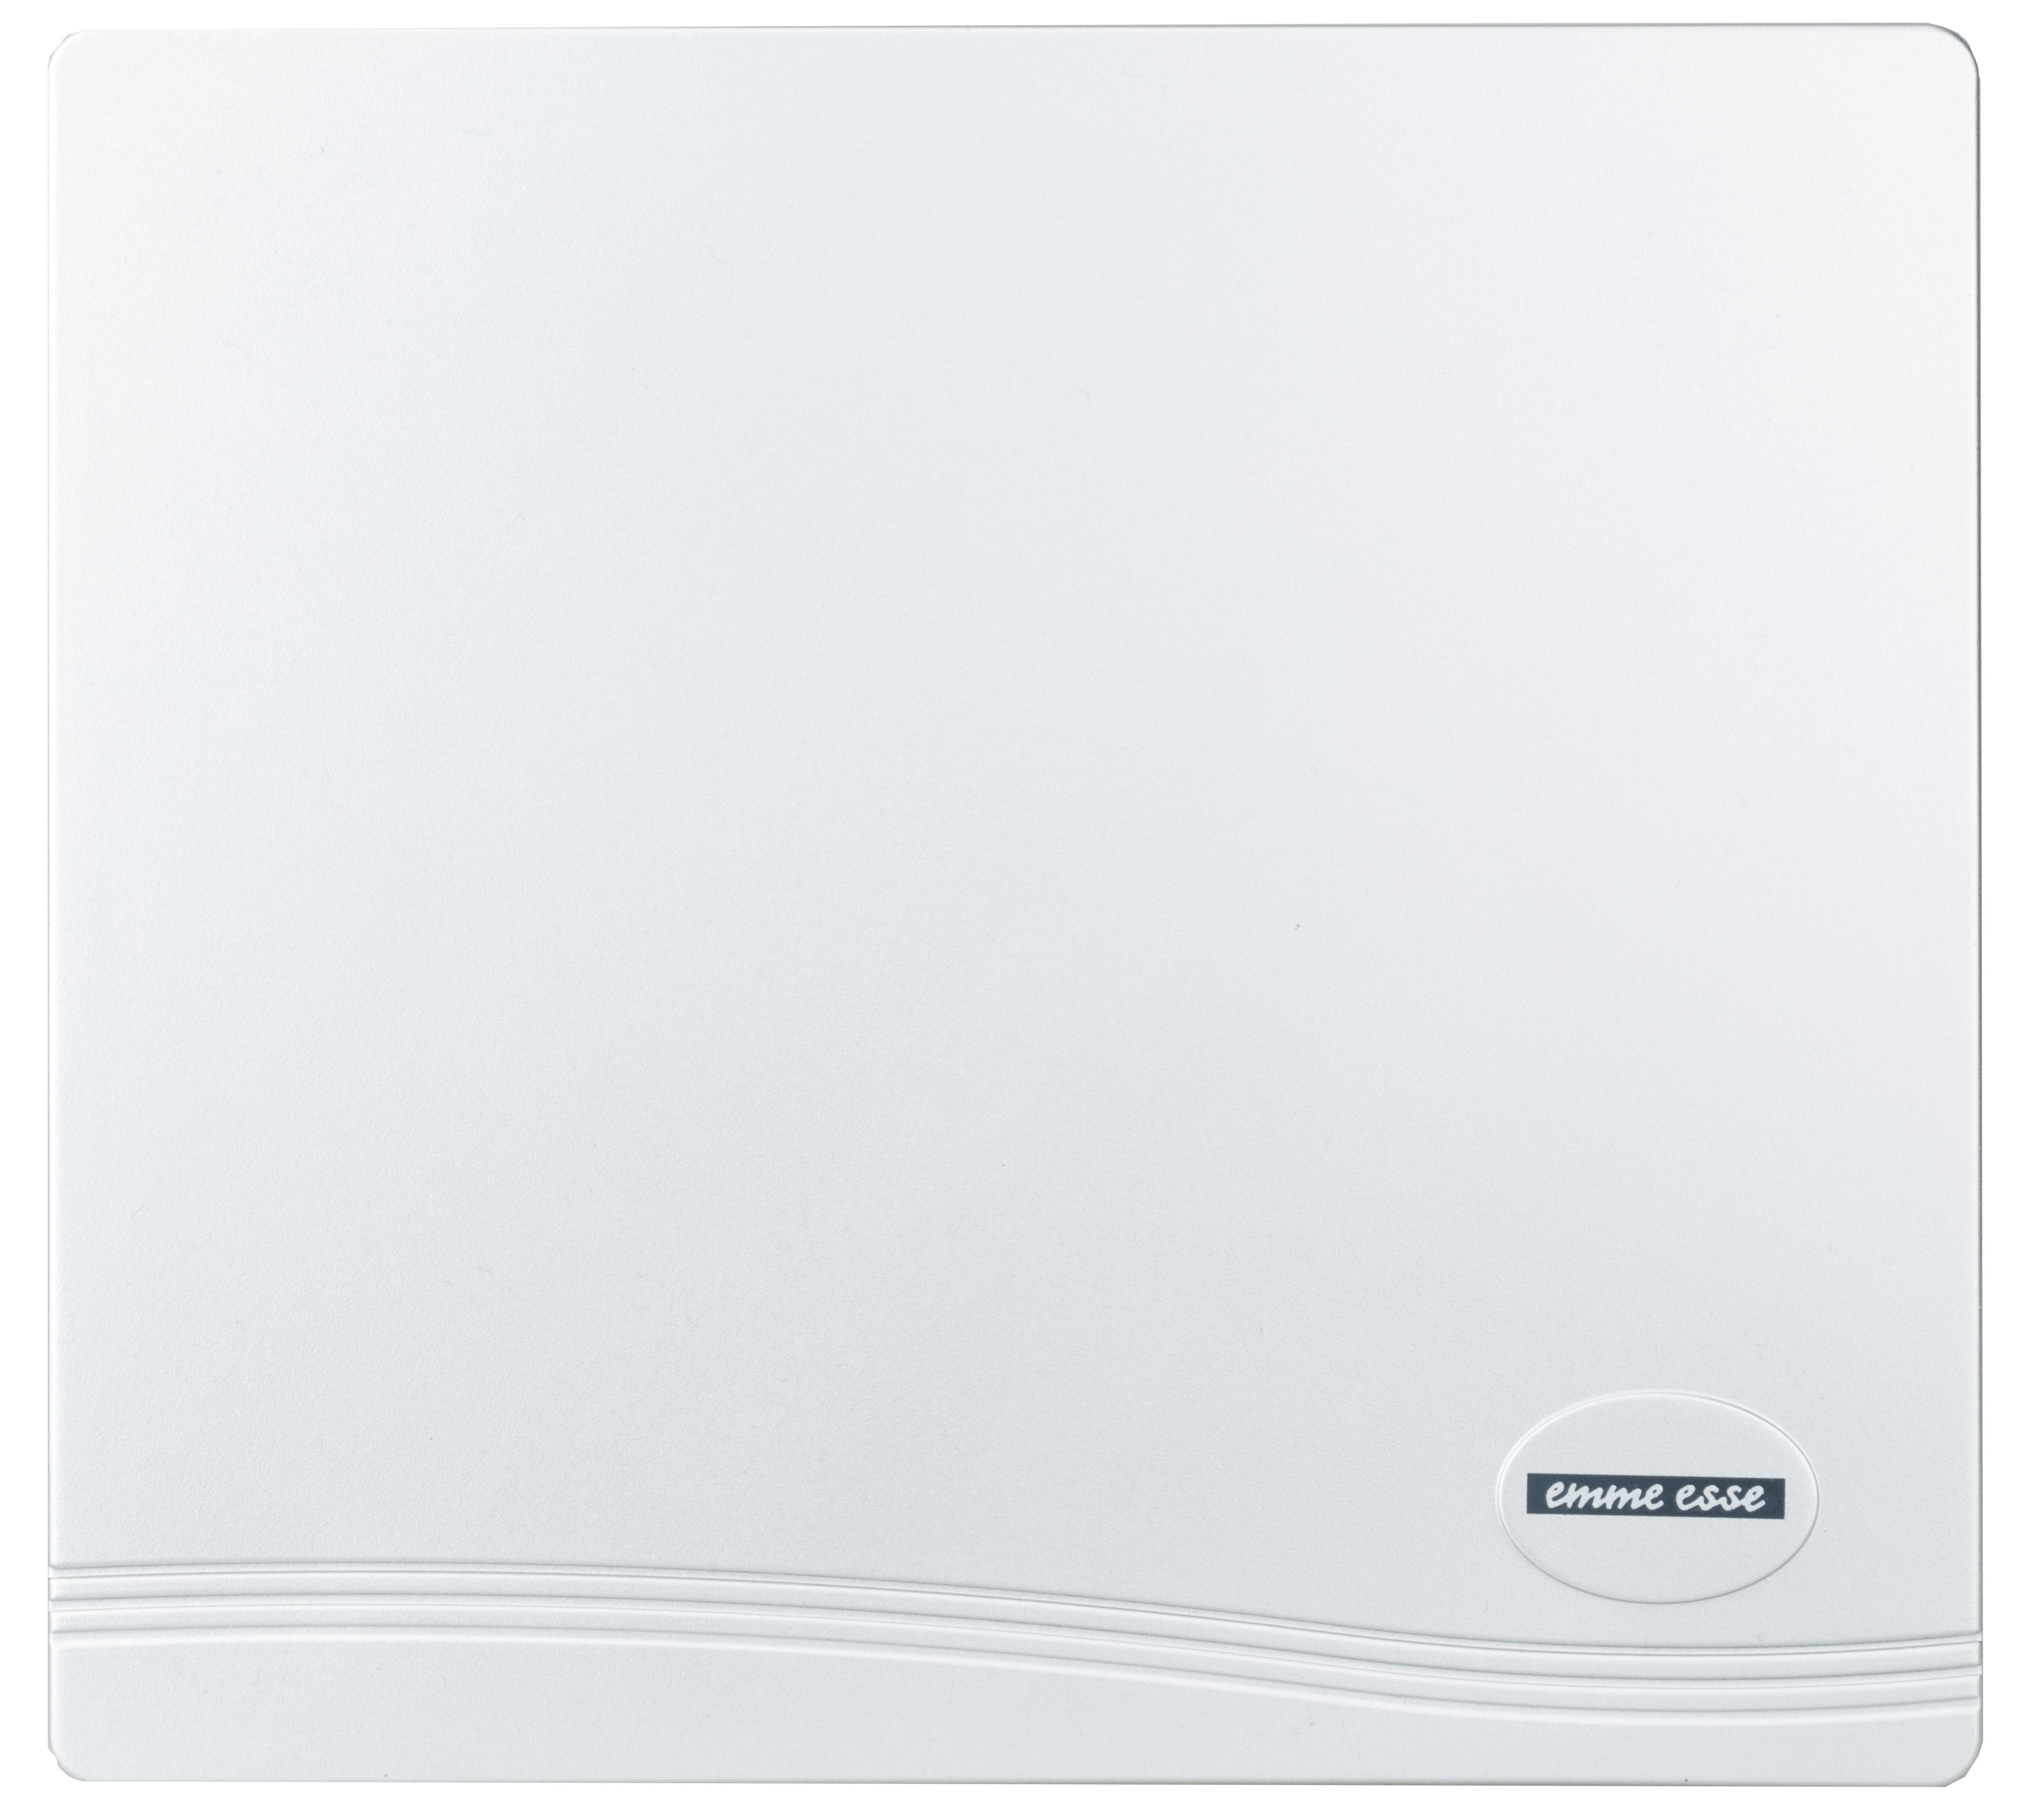 1 Stk DVB-T2 Antenne Innen Flach, 220VAC/12VDC, inkl. Netzteil HSATATTI01